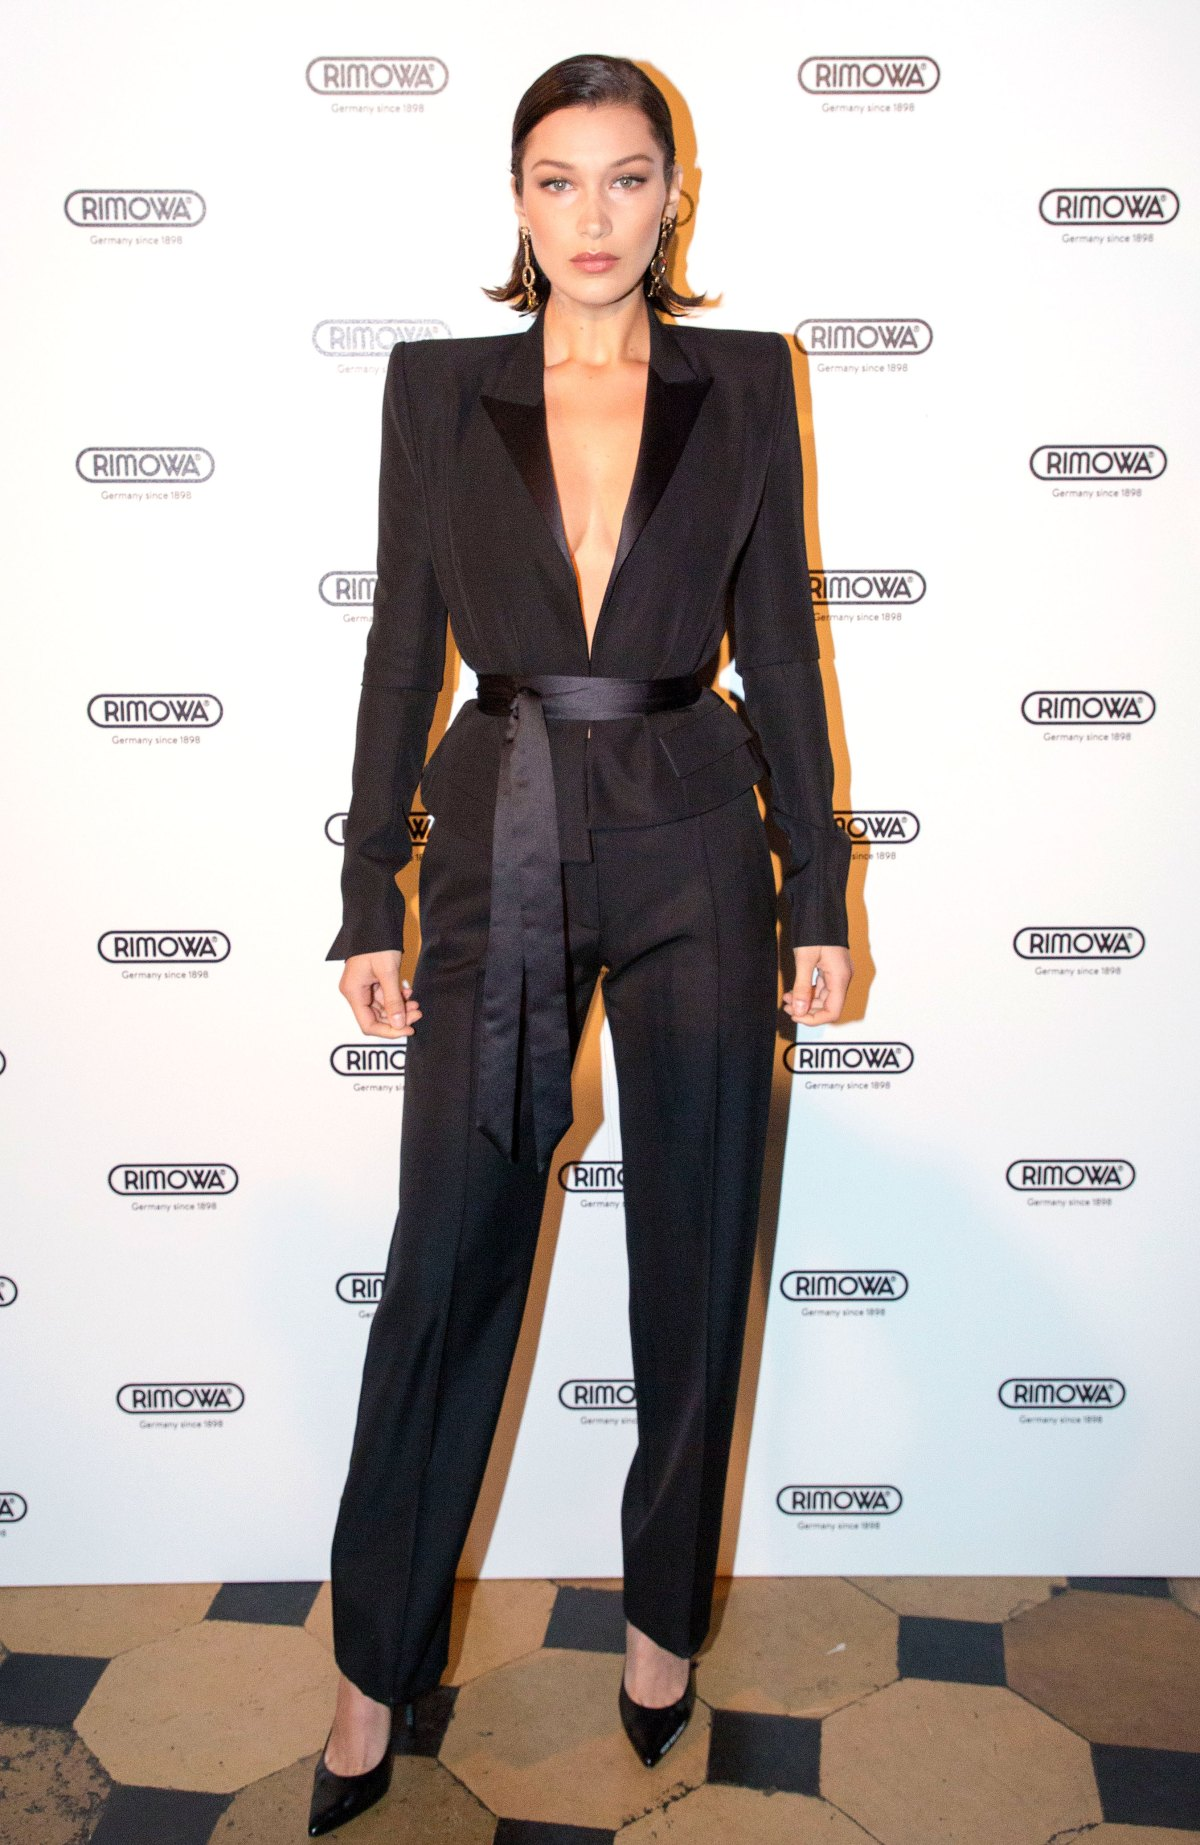 shirtless tuxedo celeb fashion trend: kim kardashian, more